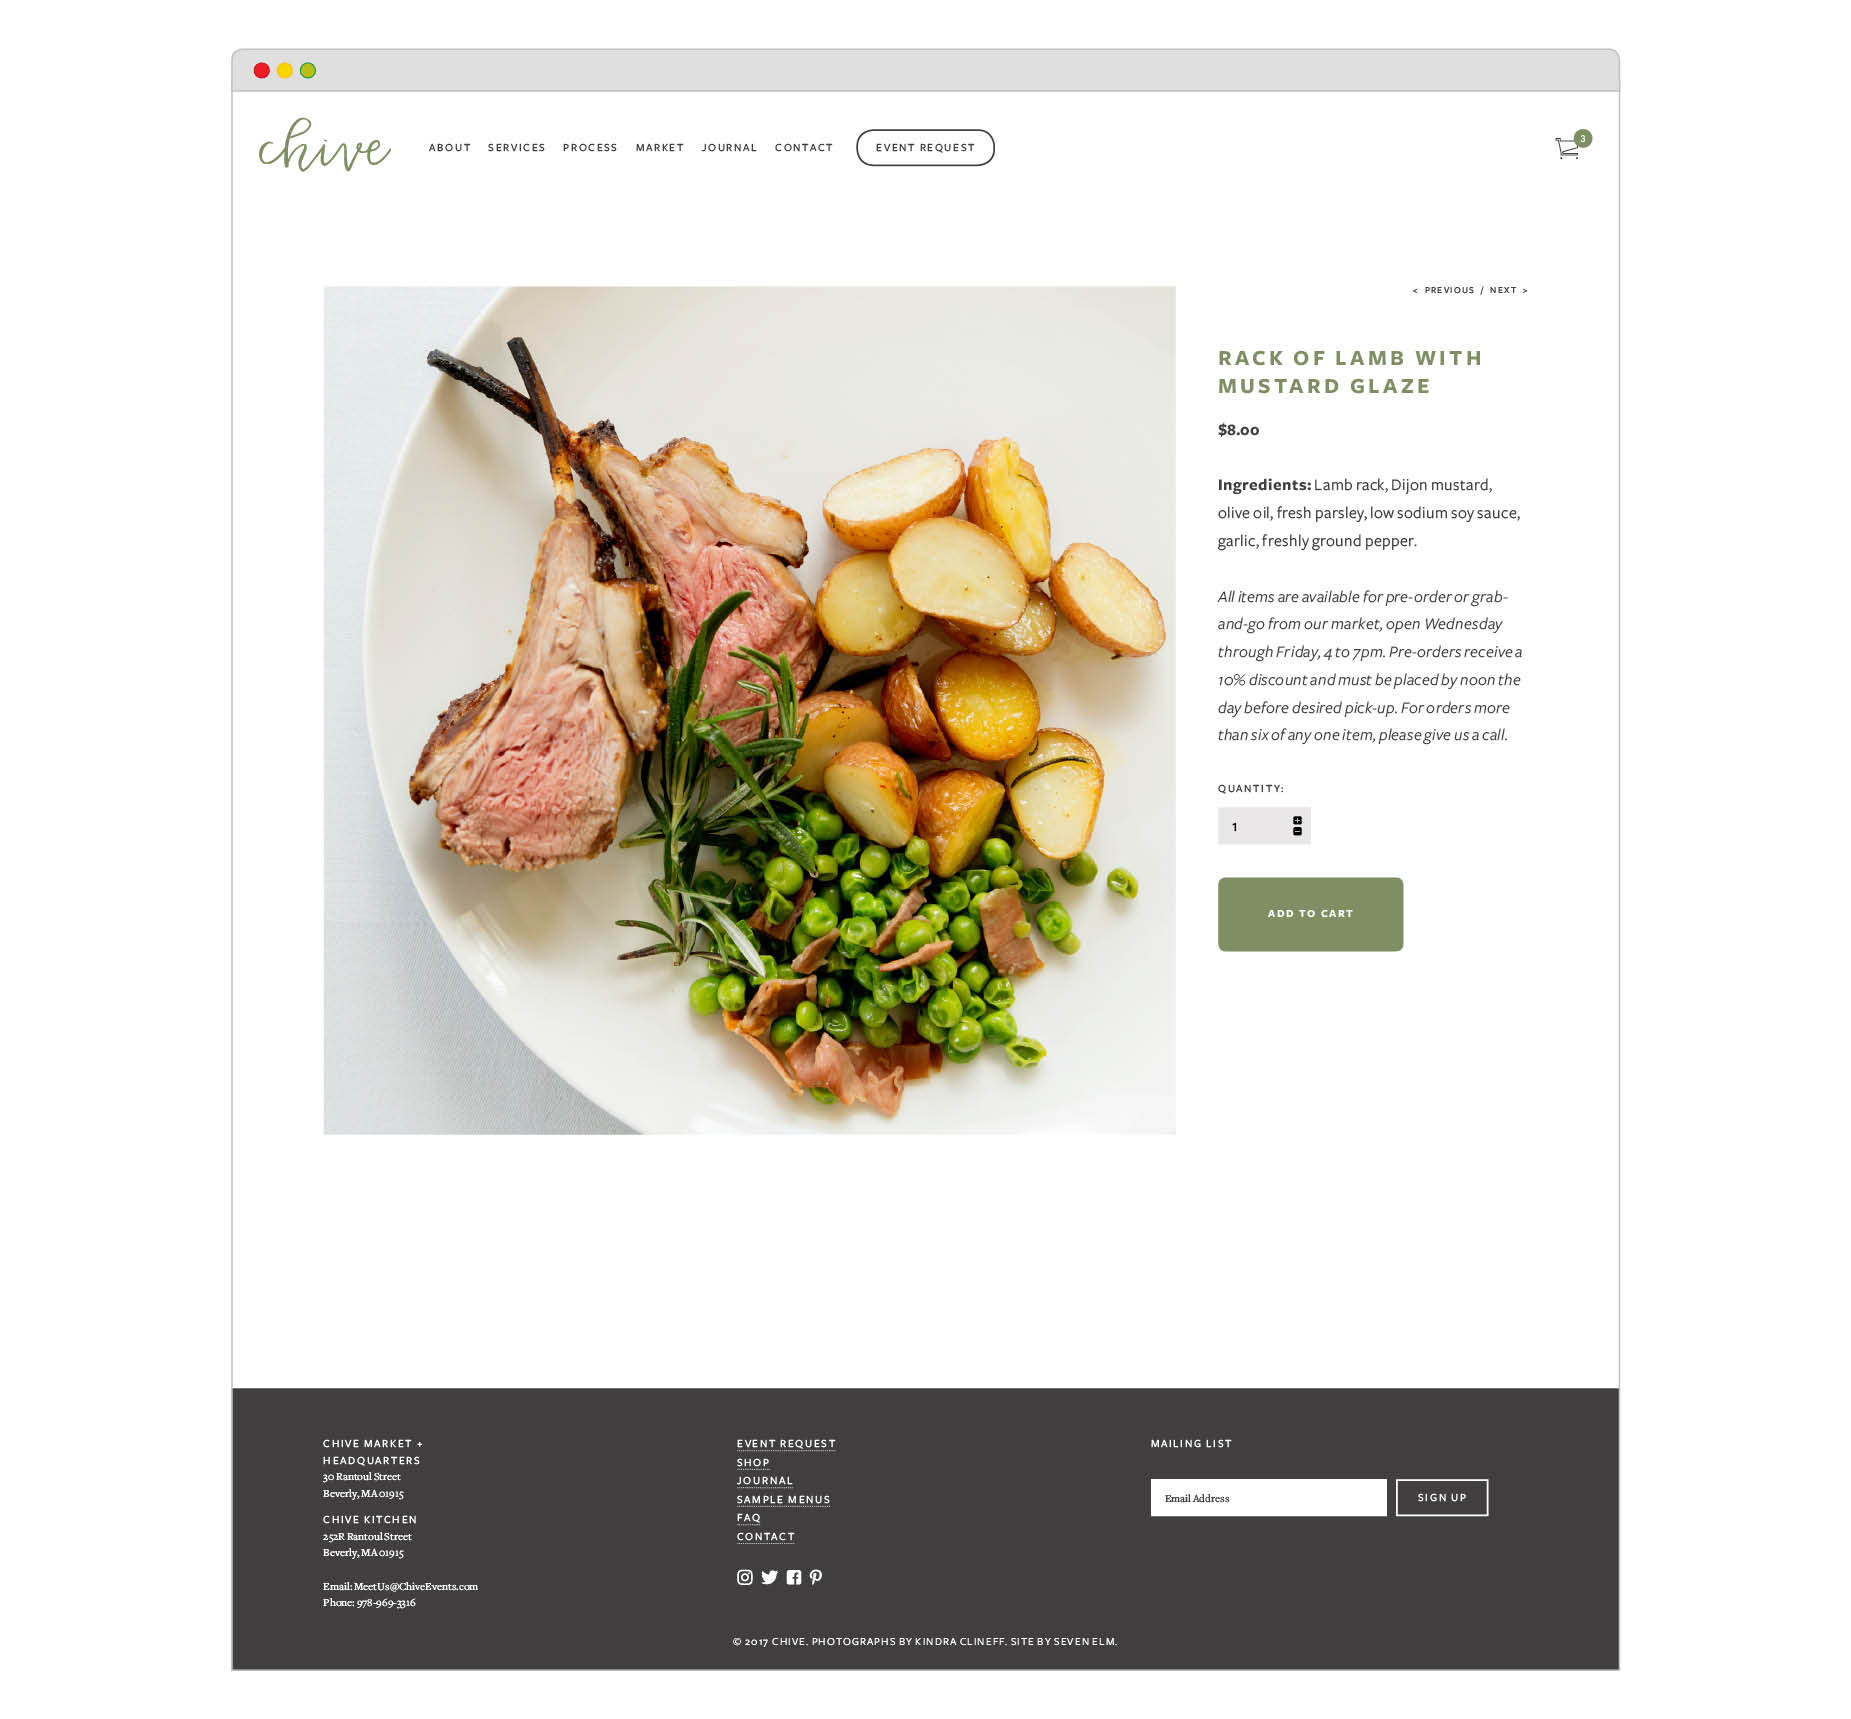 Chive_Website_Market_02.jpg